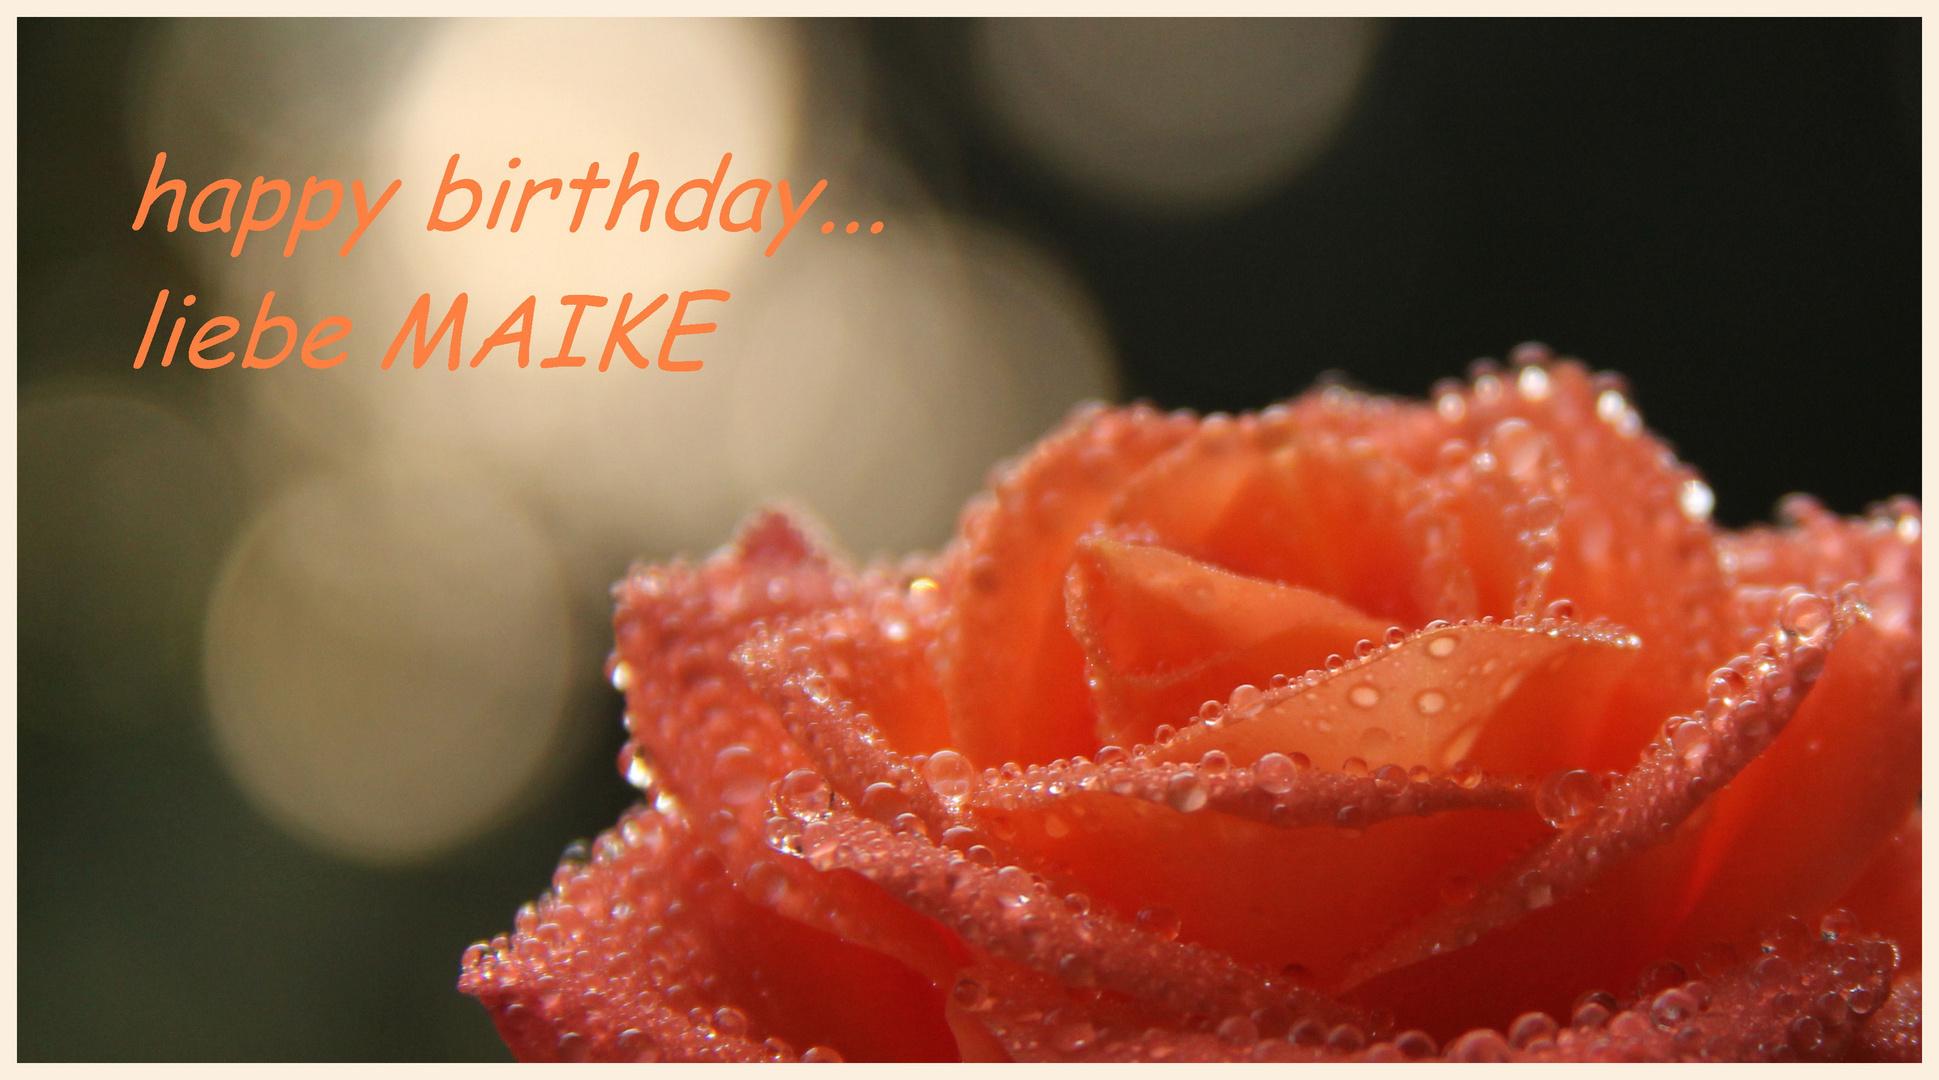 Geburtstagsgrüße für Maike....